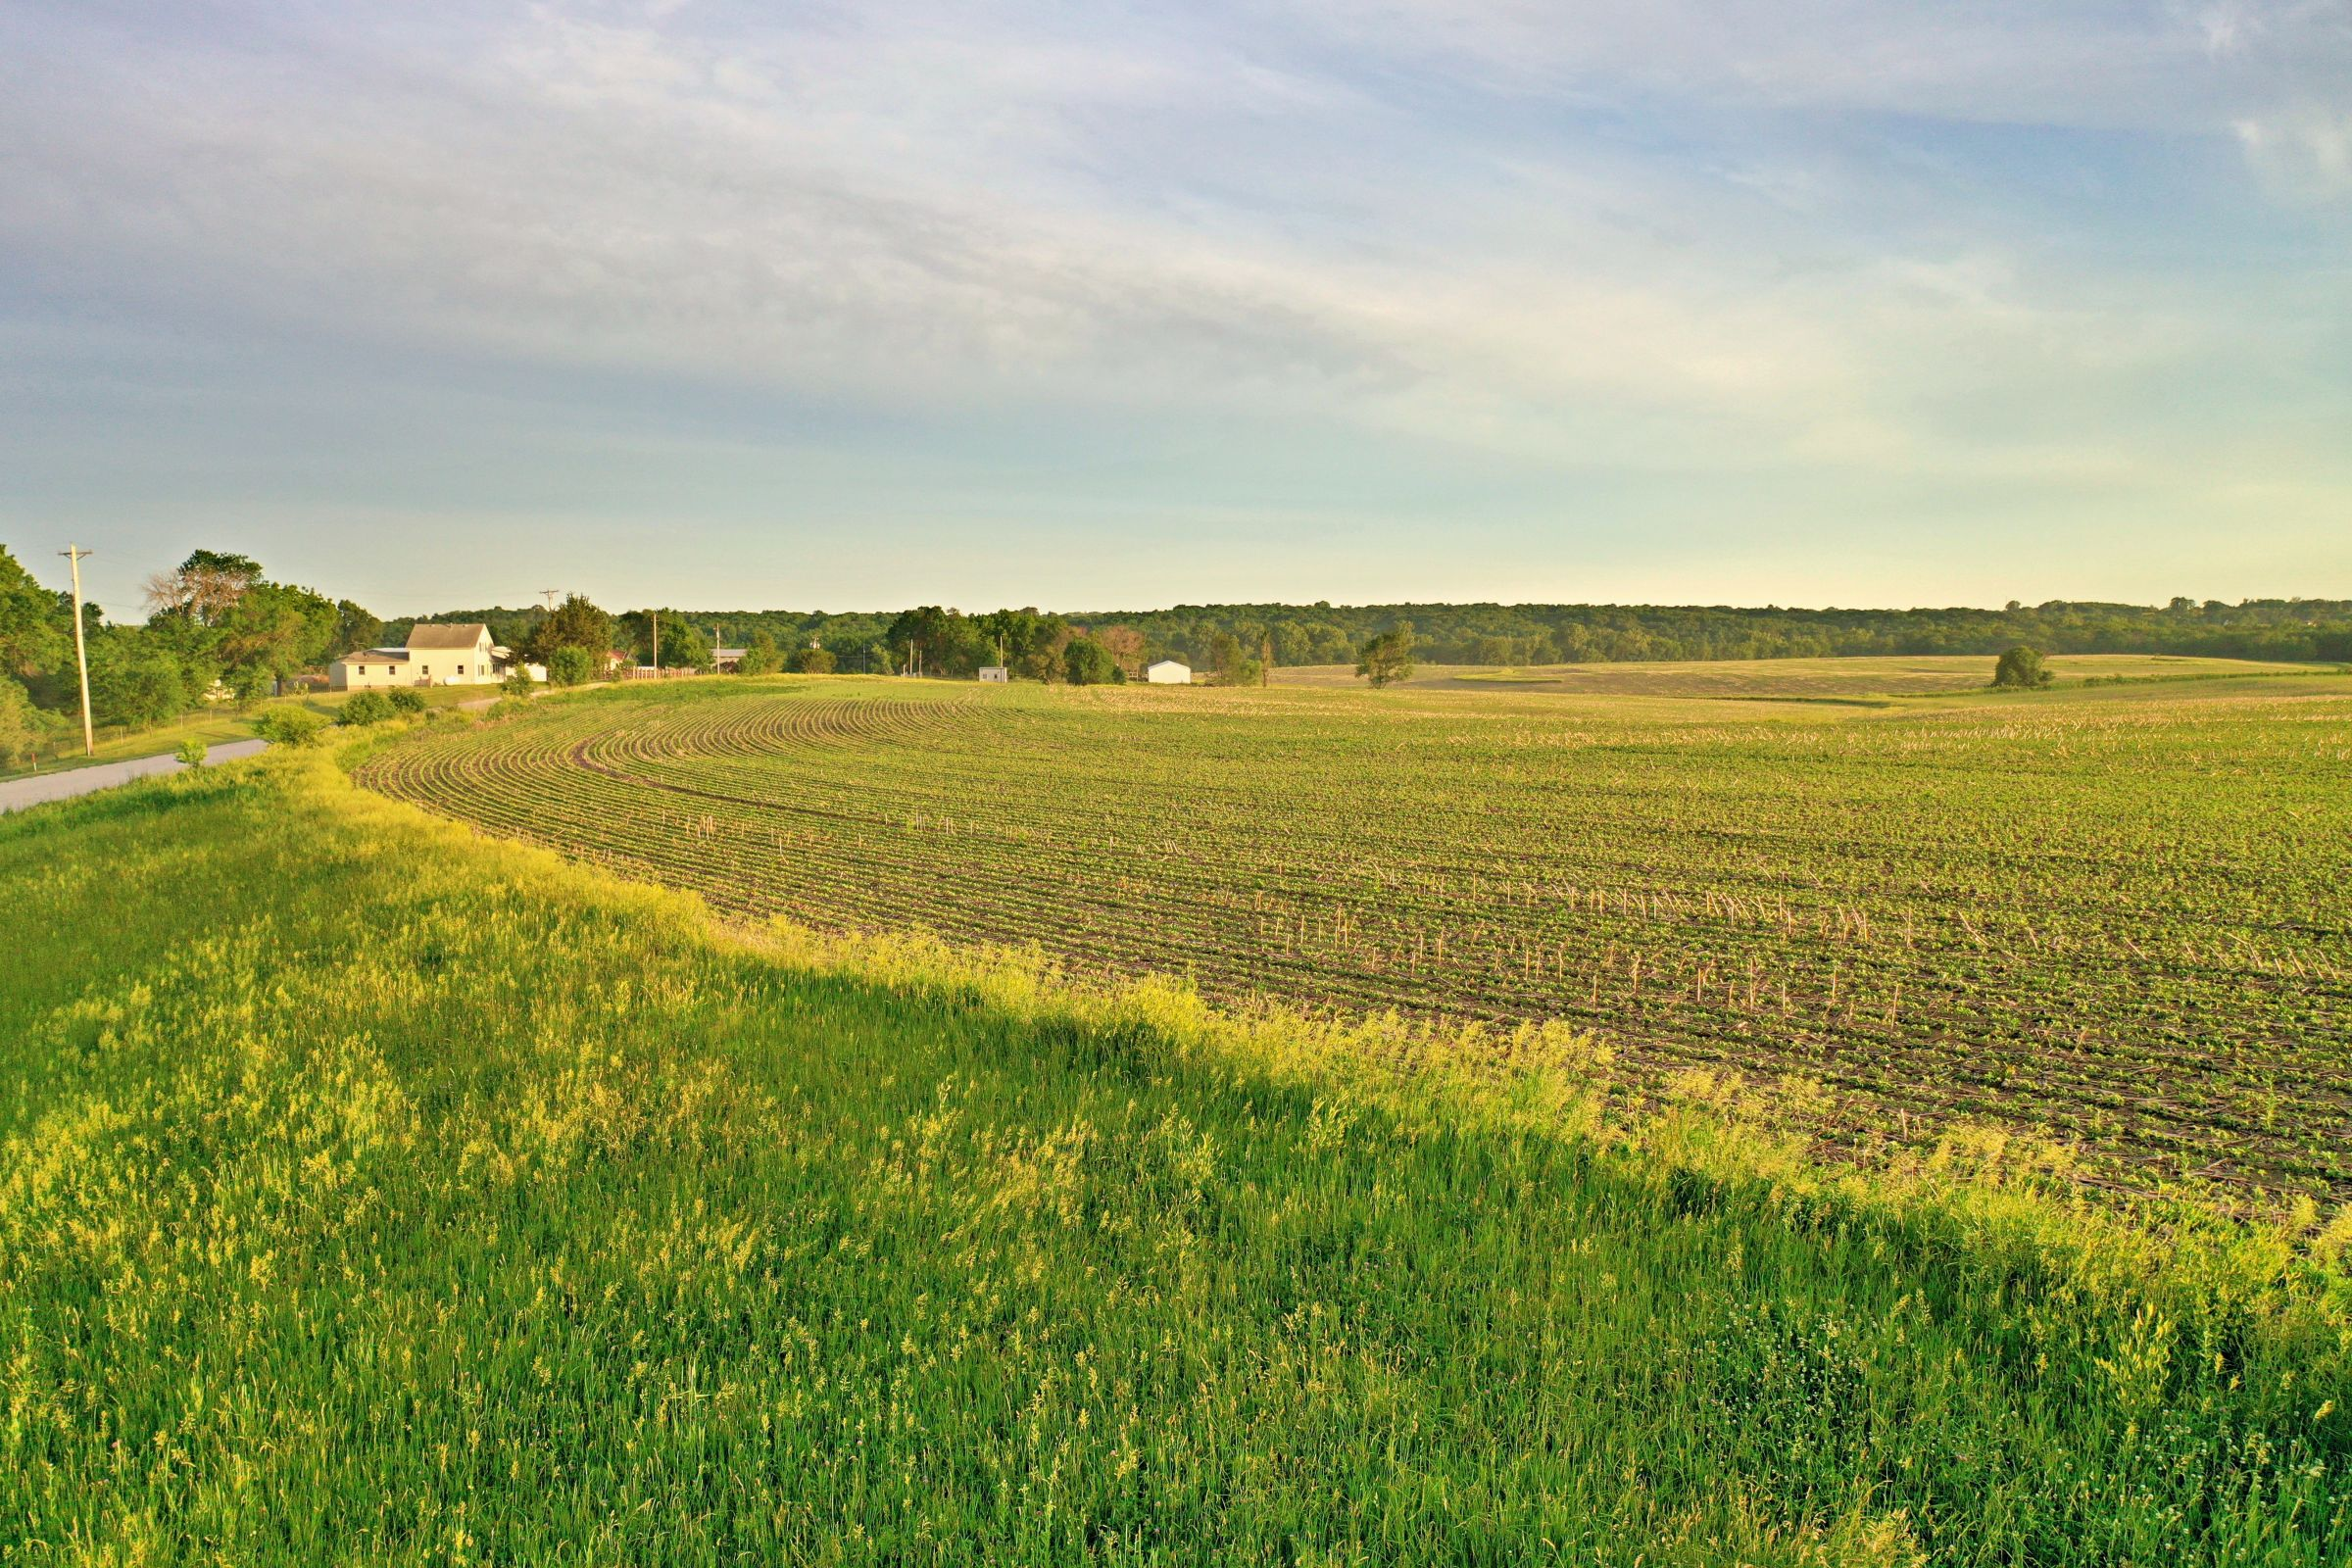 land-warren-county-iowa-80-acres-listing-number-15328-4-2021-01-25-192211.JPG